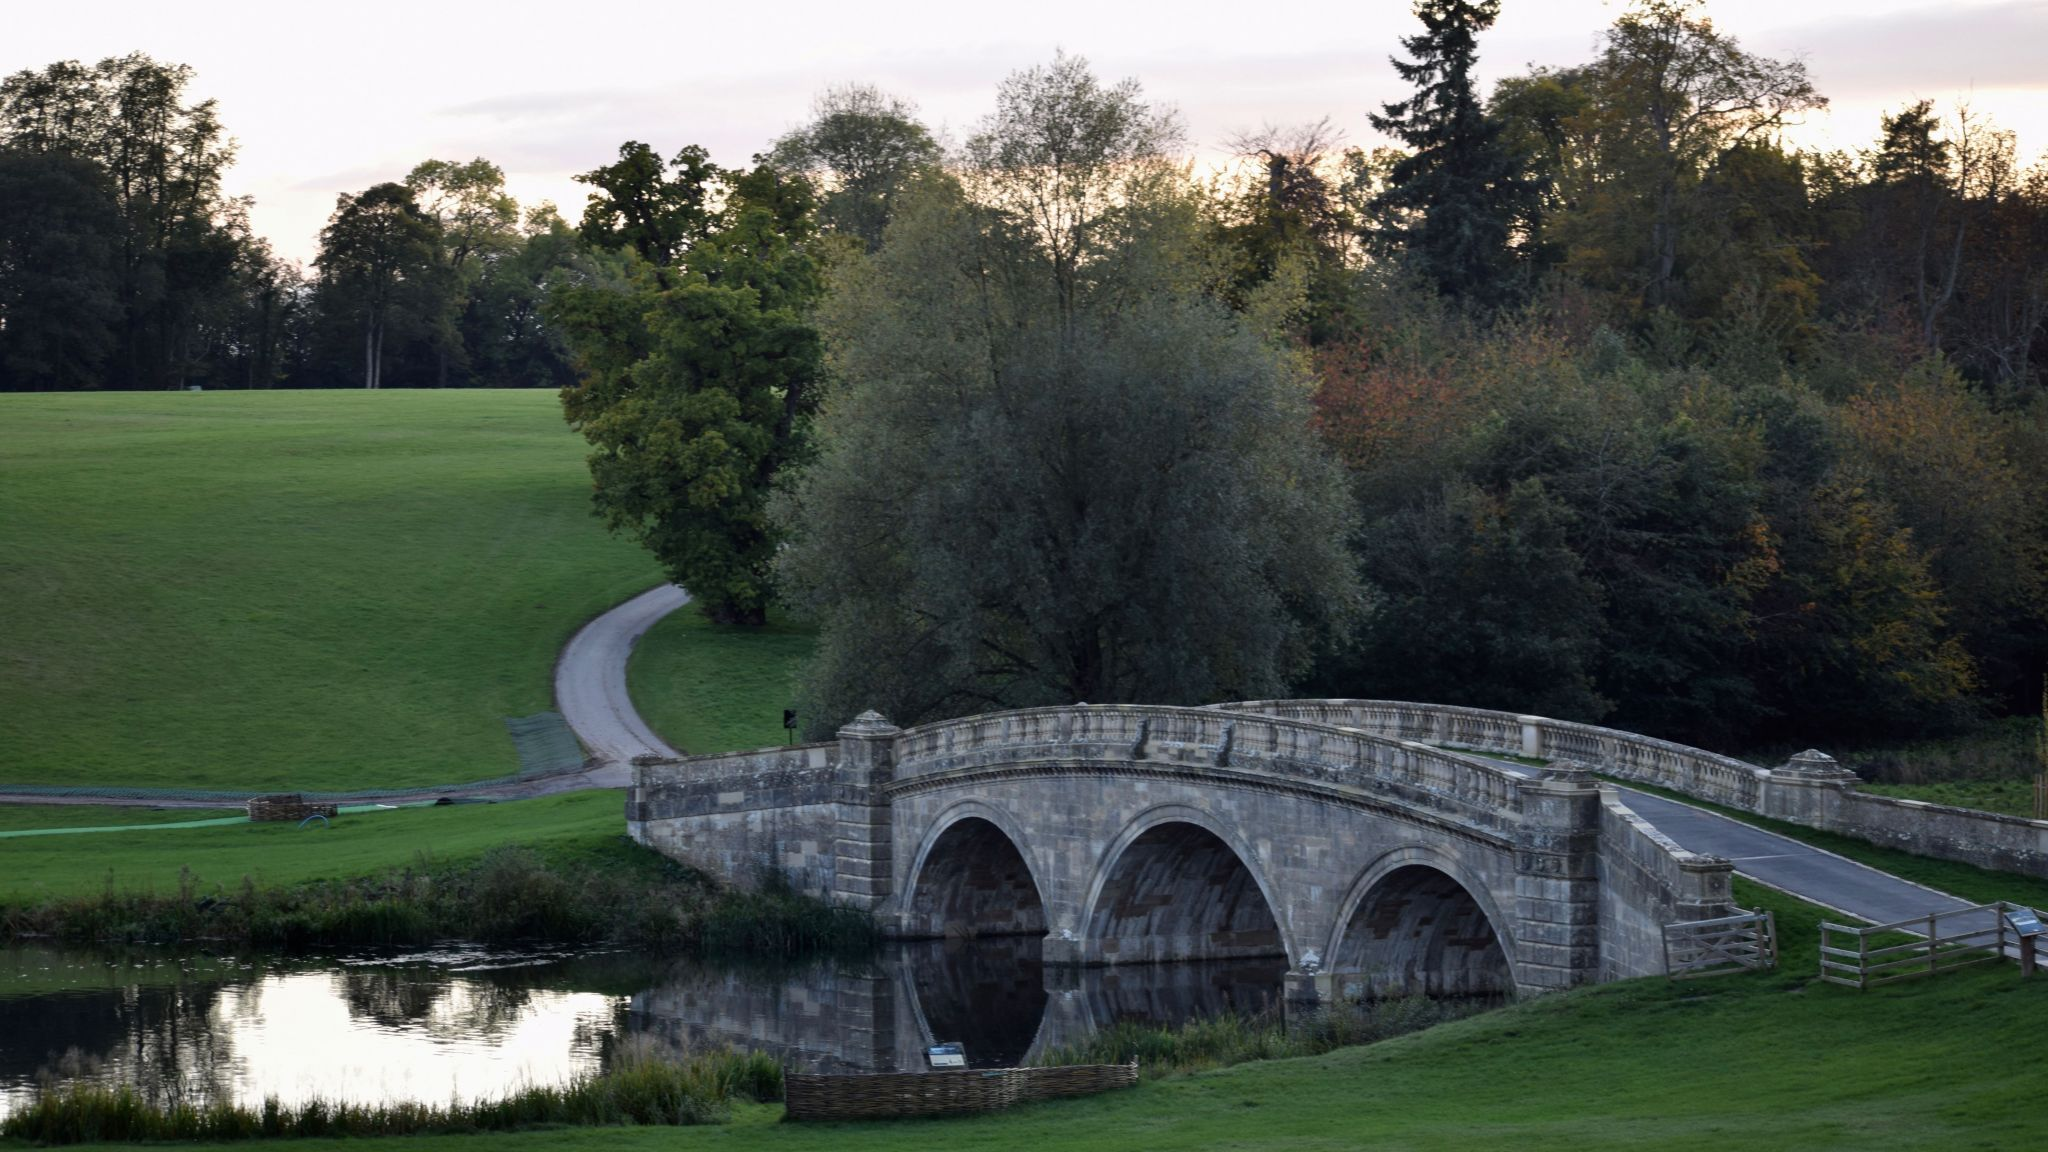 Blenheim Palace - Bladon Bridge, United Kingdom